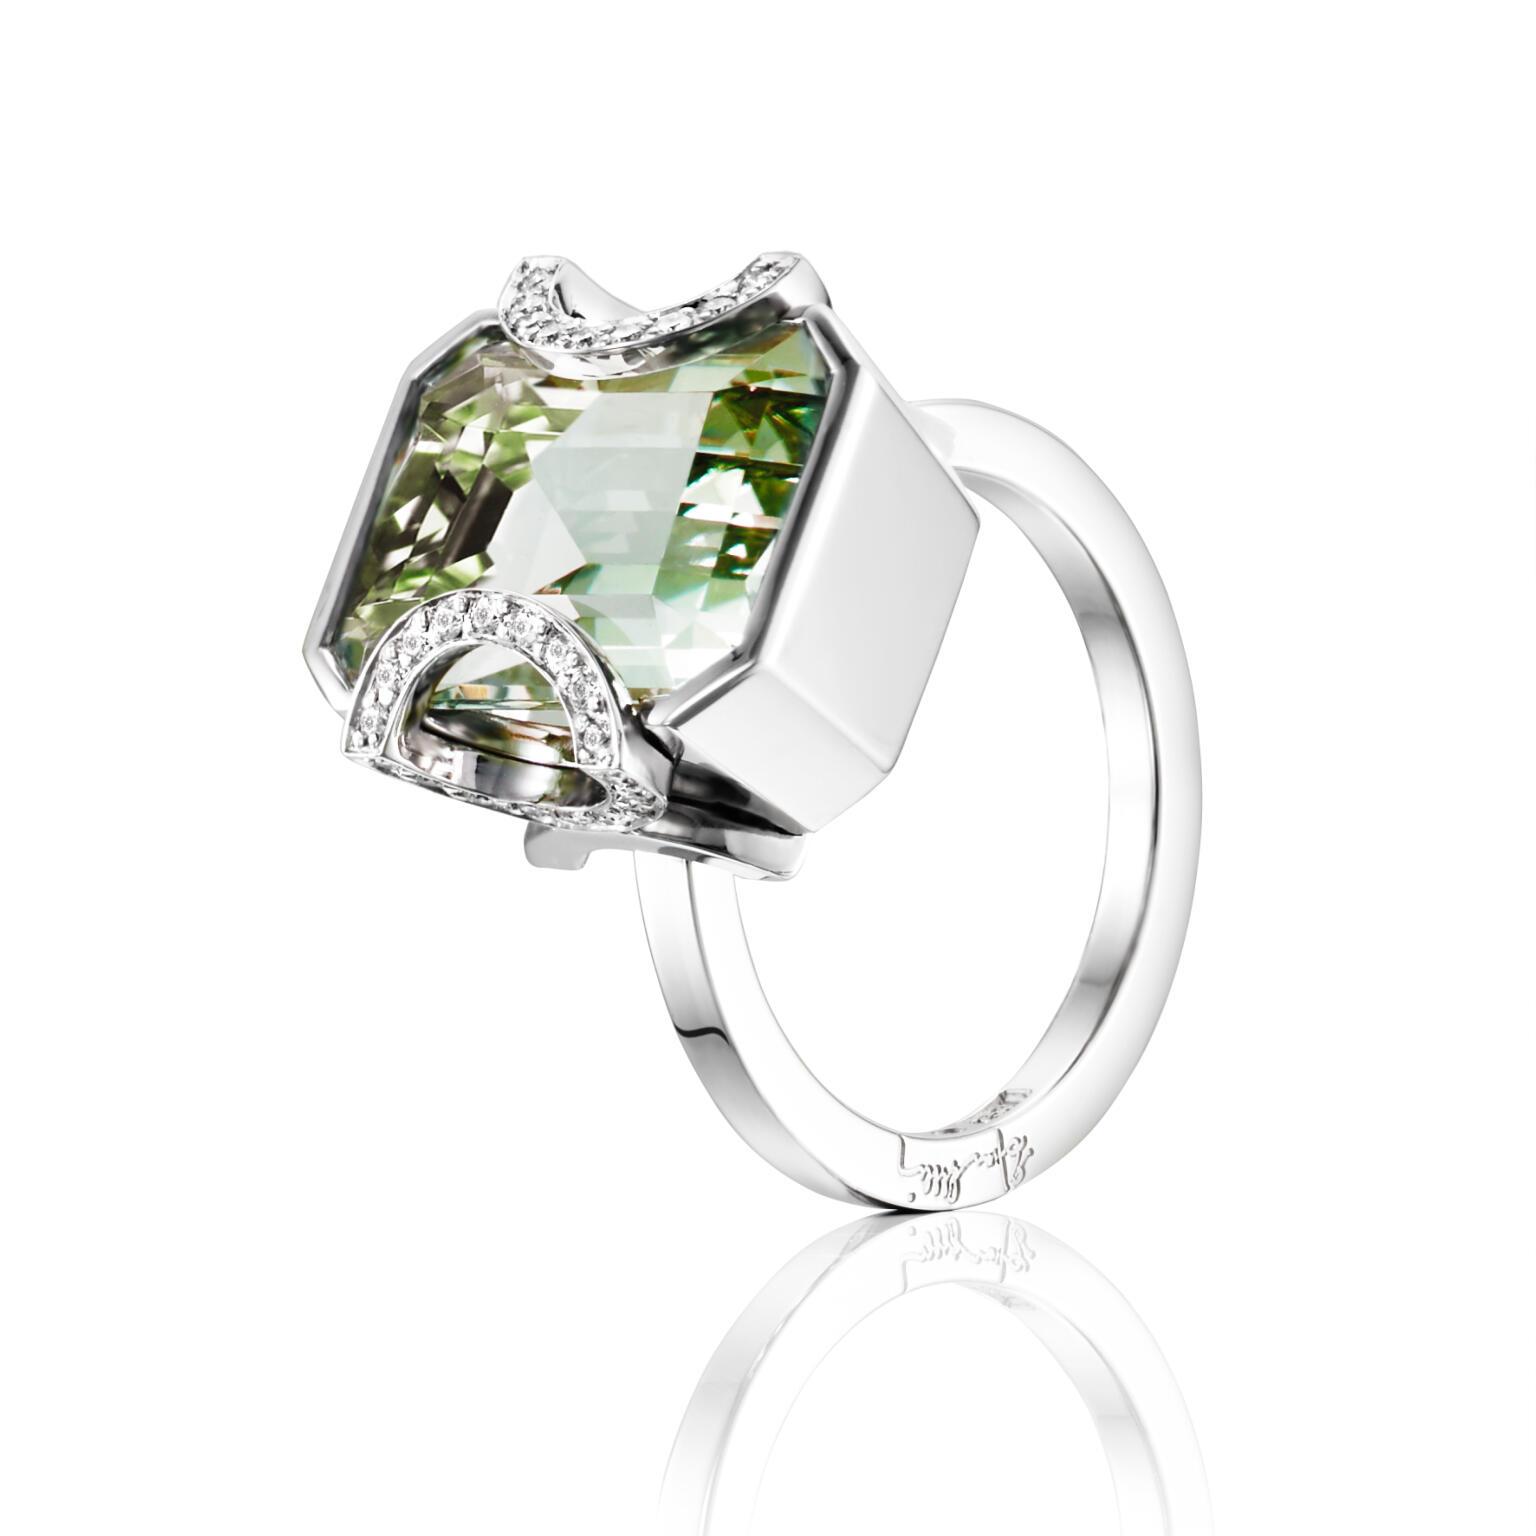 Little Magic Star Ring – Green Quartz, Vitt guld